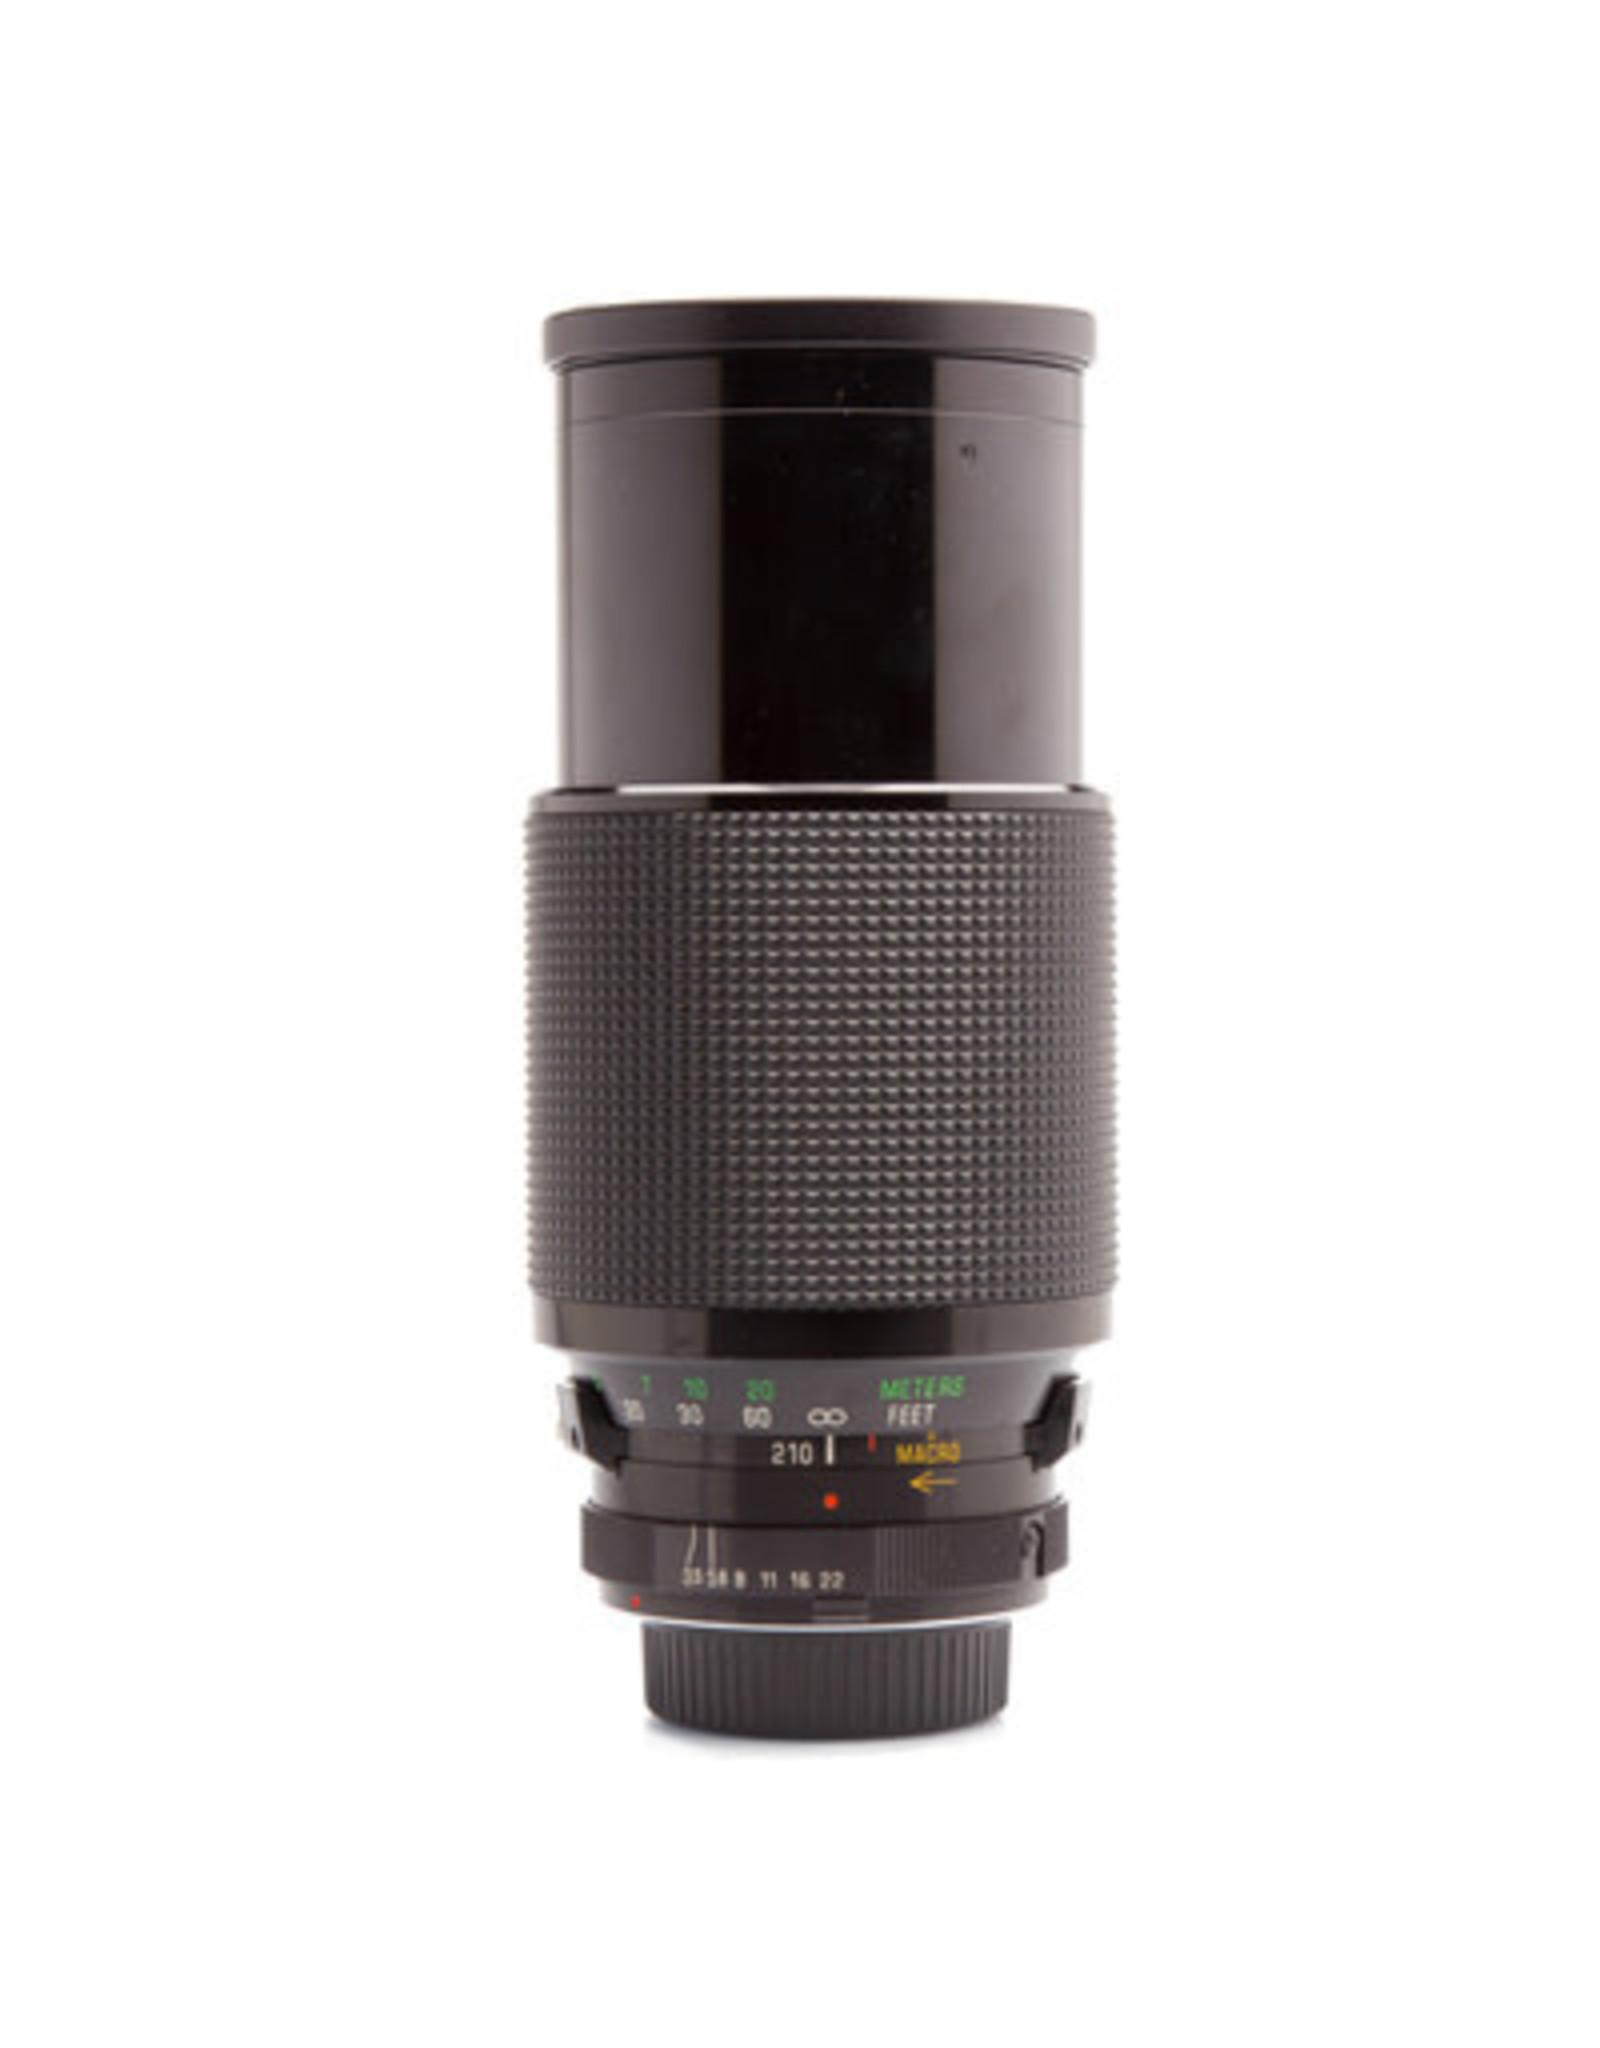 Vivitar Vivitar Series 1 70-210mm f3.5 Zoom Lens For Minolta MD